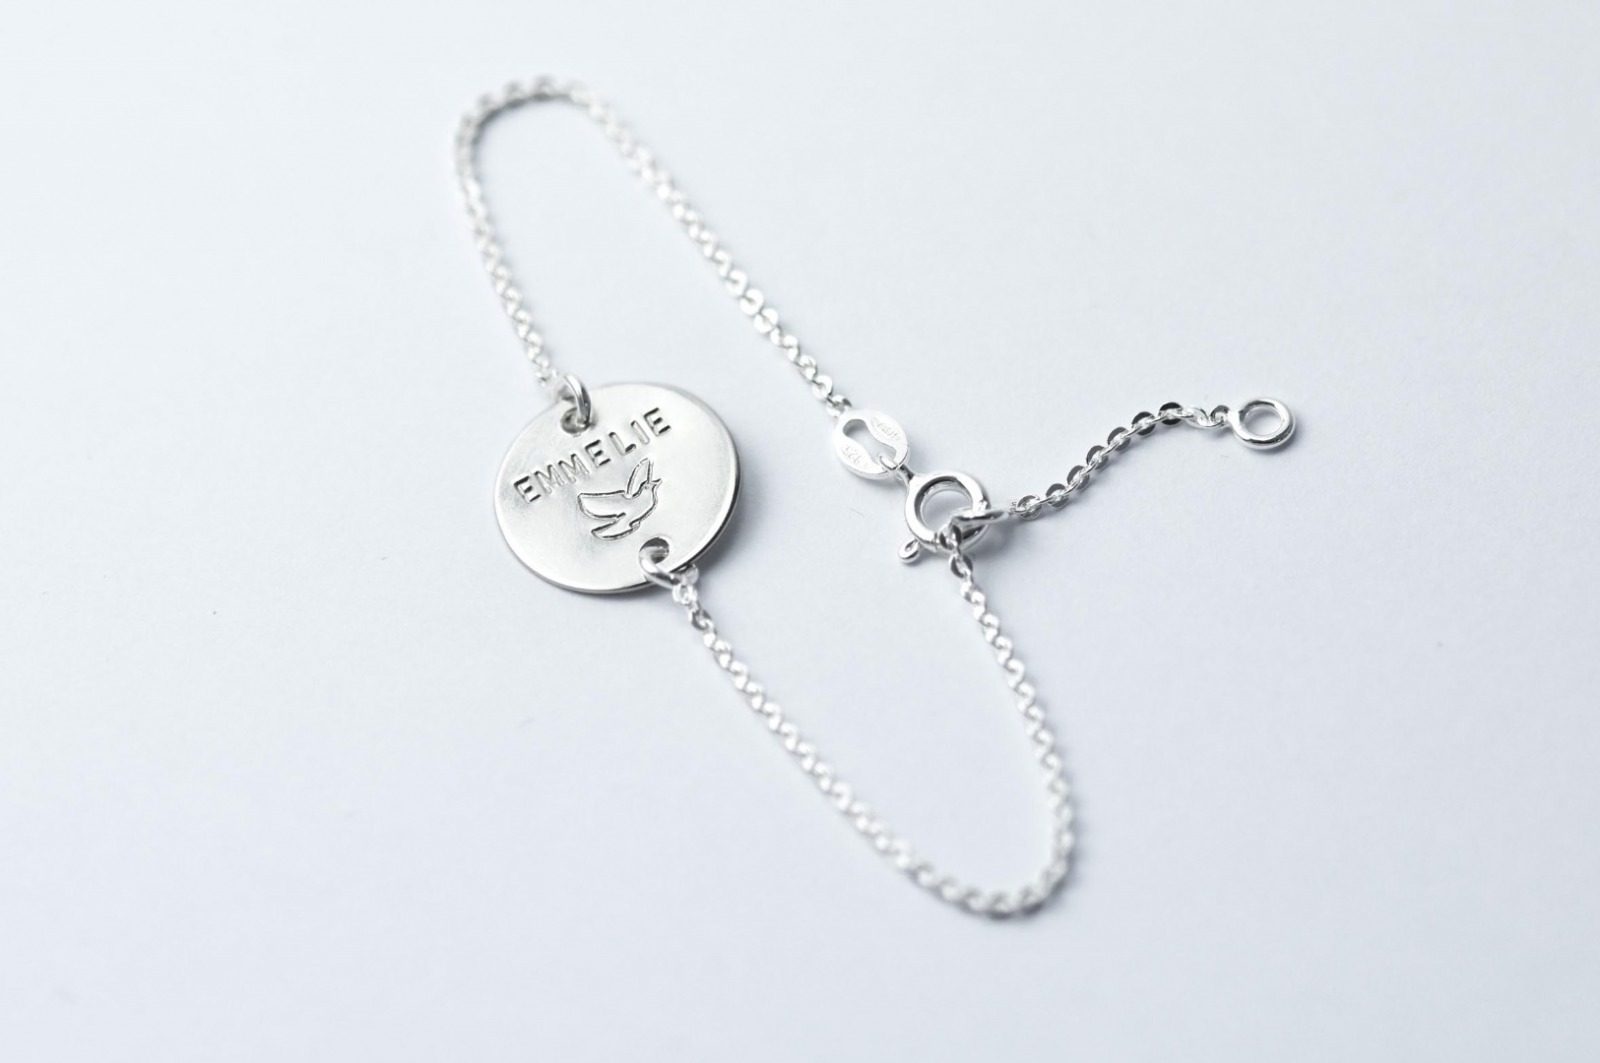 Zartes Silberarmband 1 - Namens- Geburts- - 2